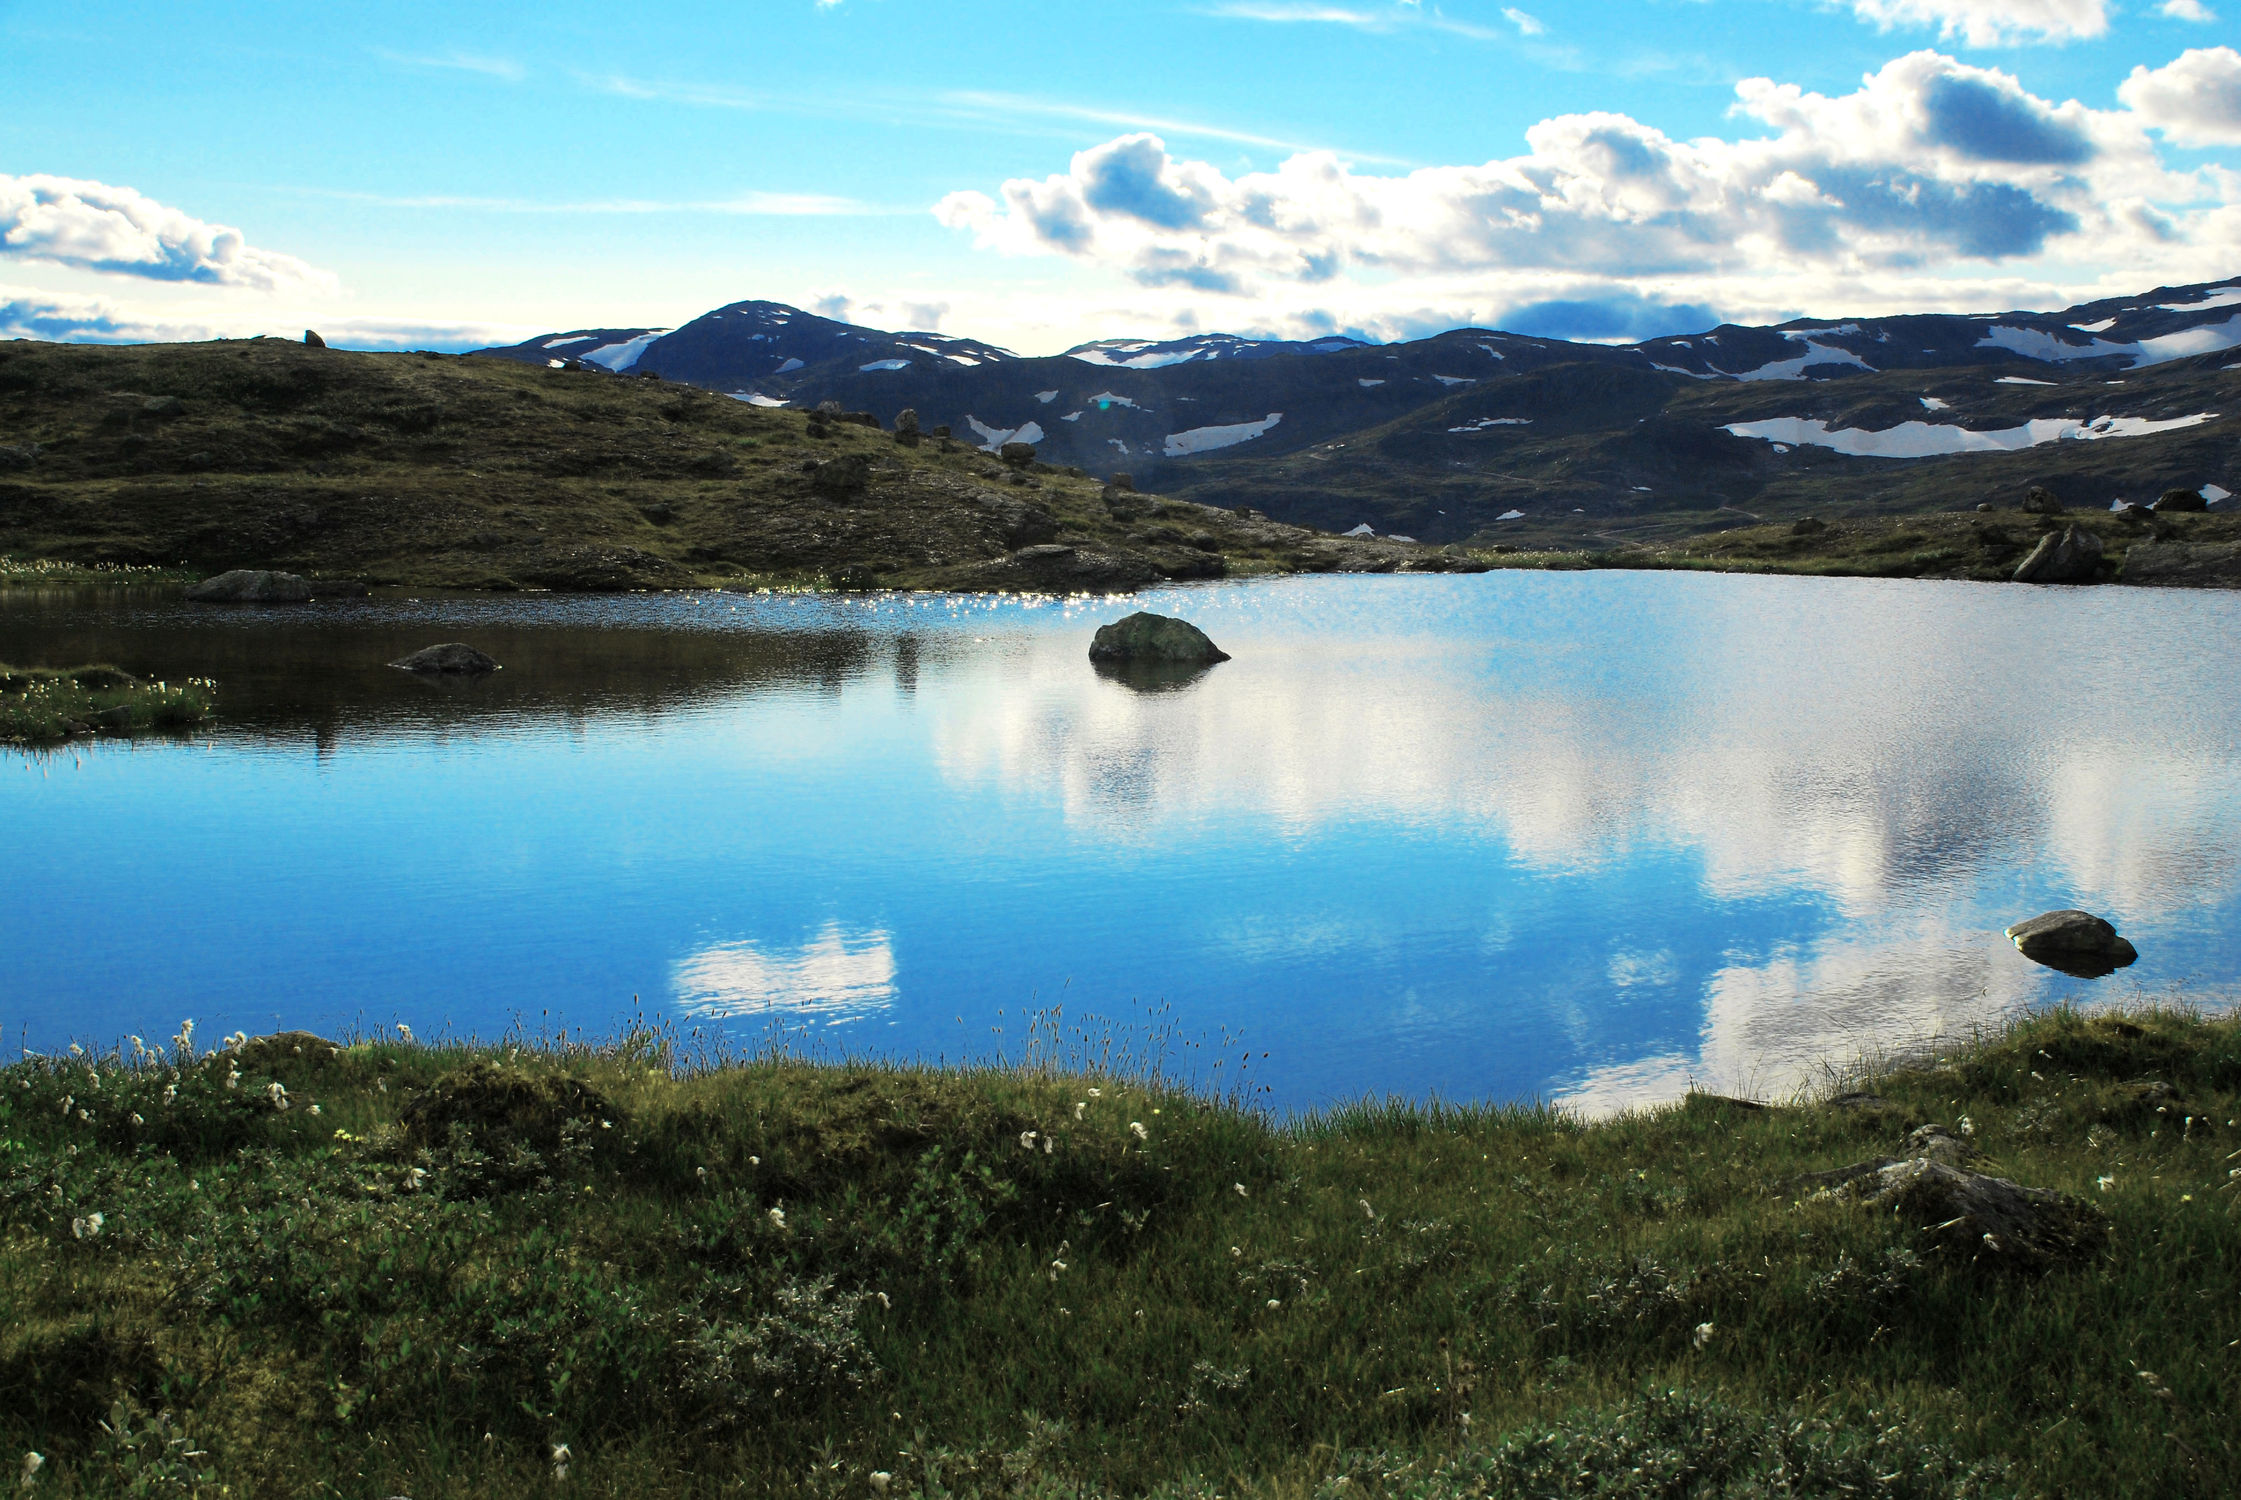 Bild mit Natur, Wasser, Landschaften, Seen, Landschaft, See, Norwegen, Gebirge